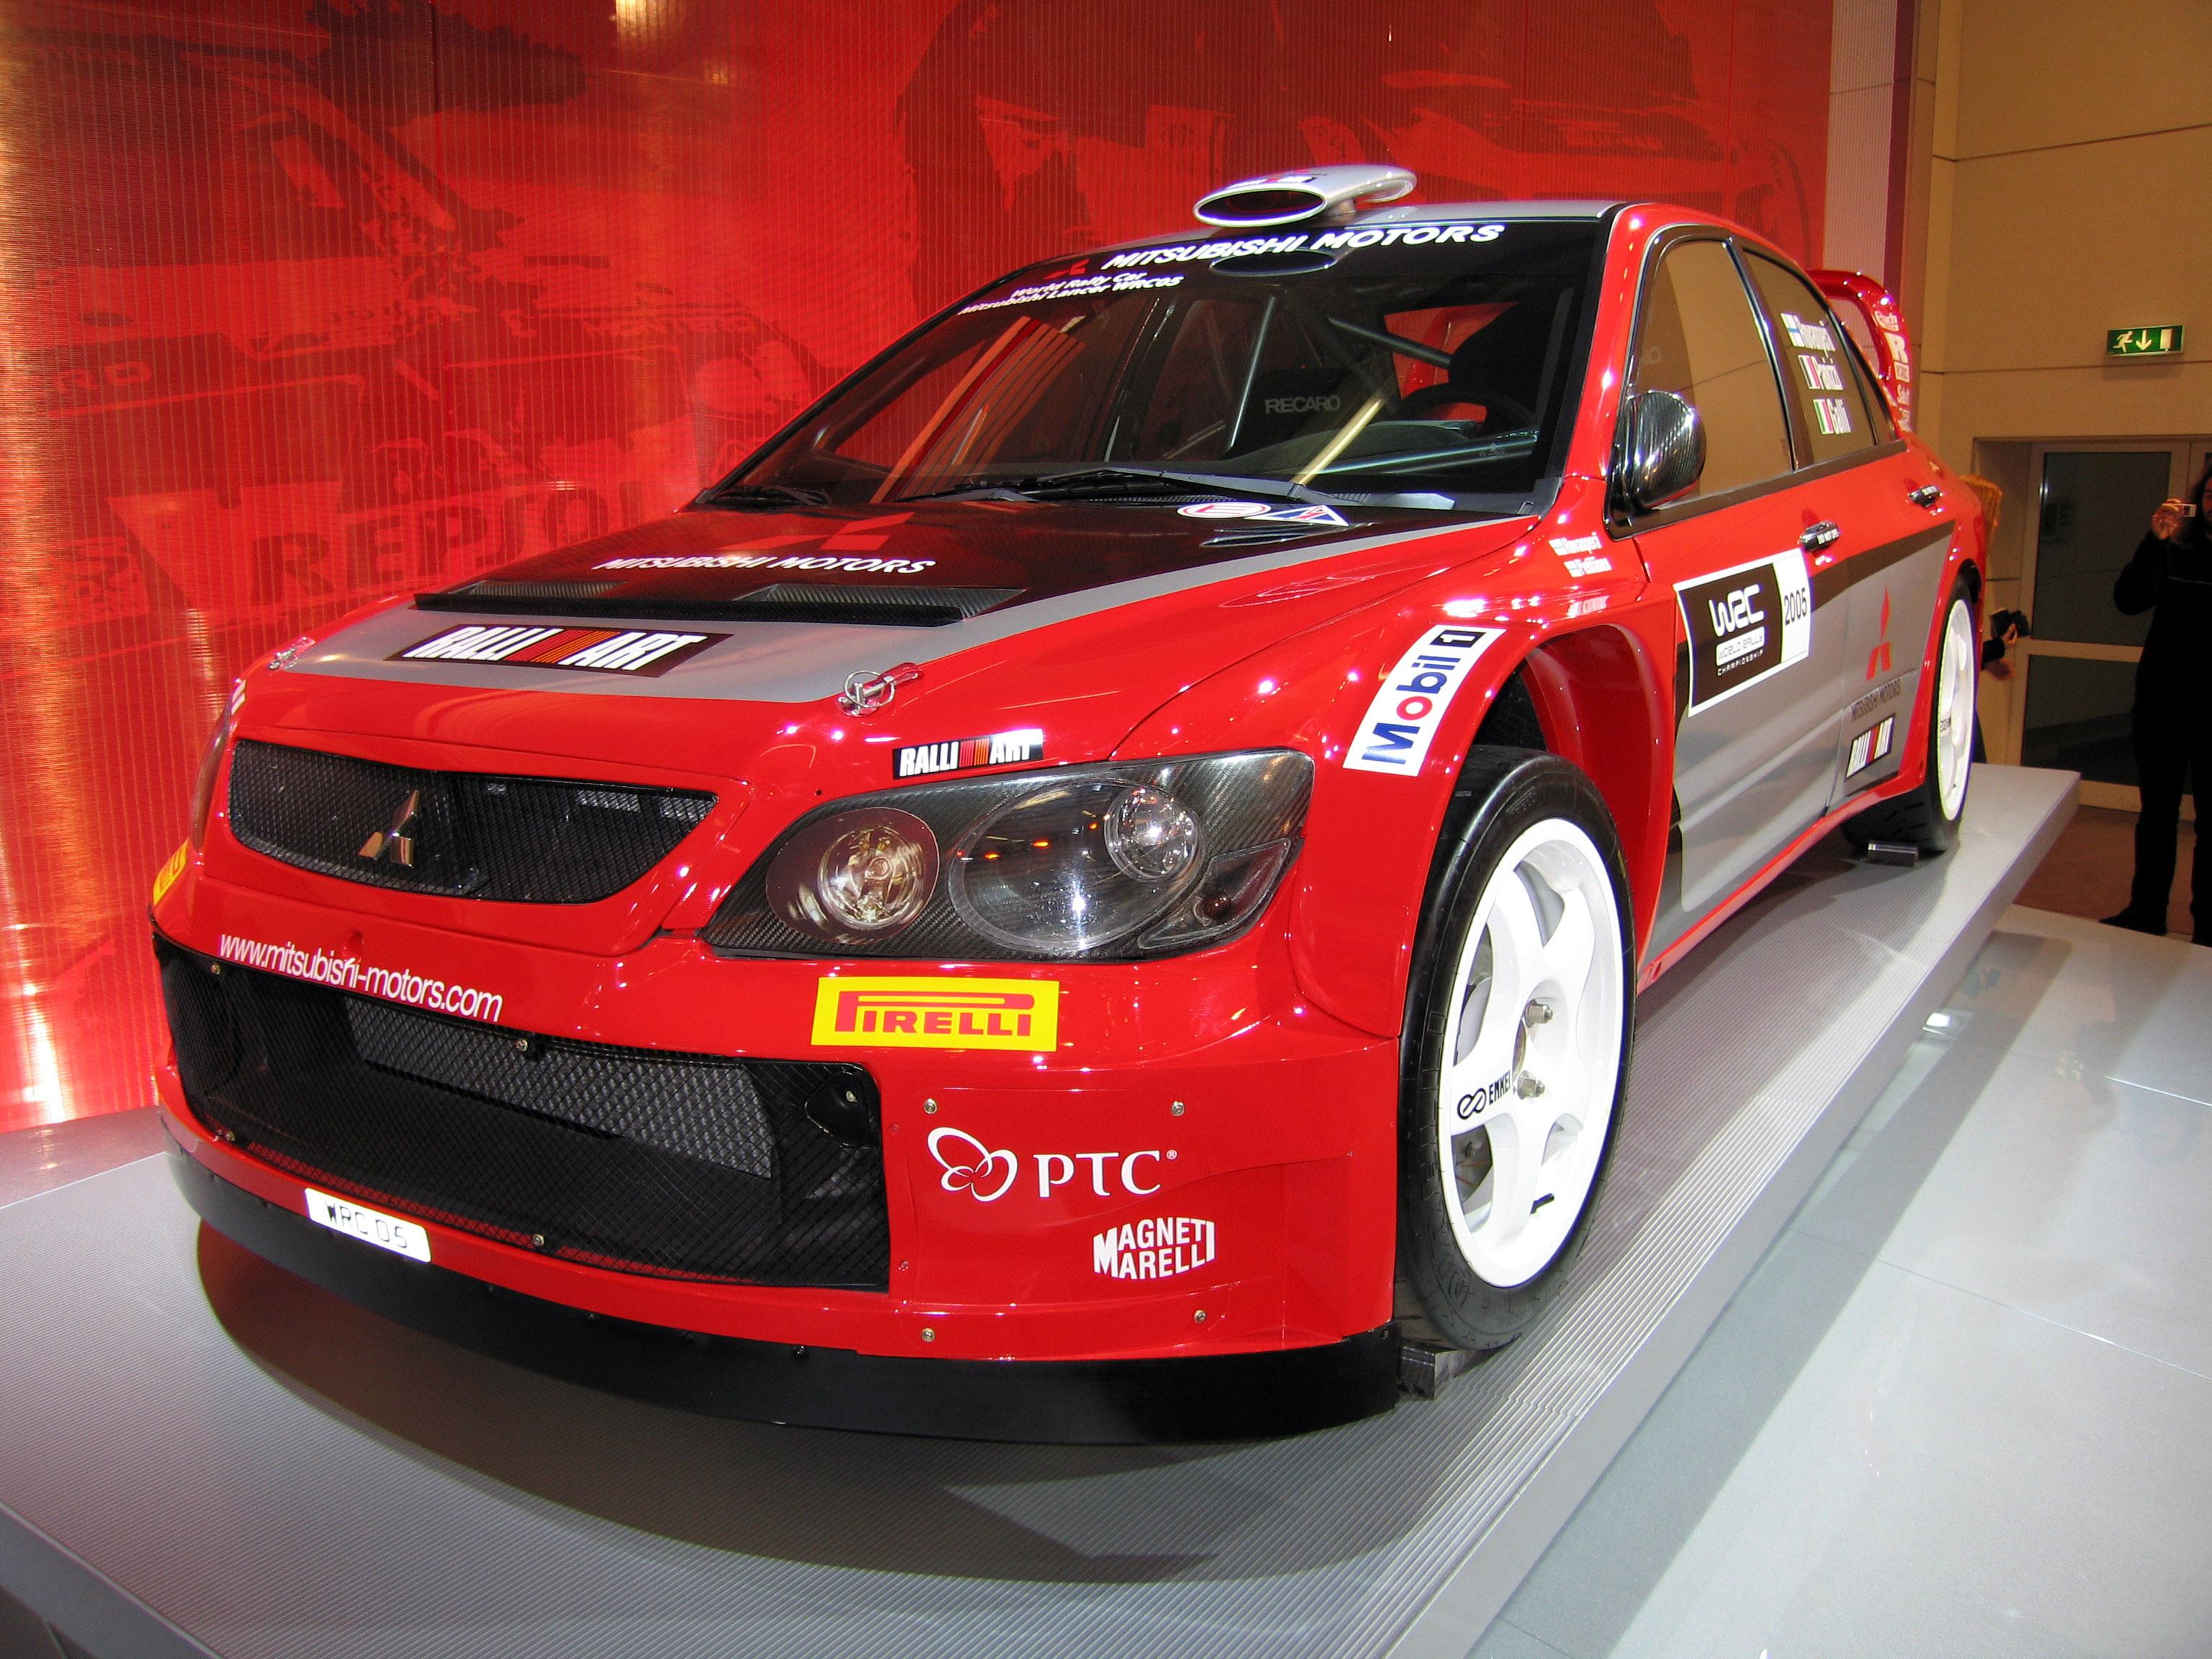 Mitsubishi_Lancer_Evolution_IX_WRC2006.jpg